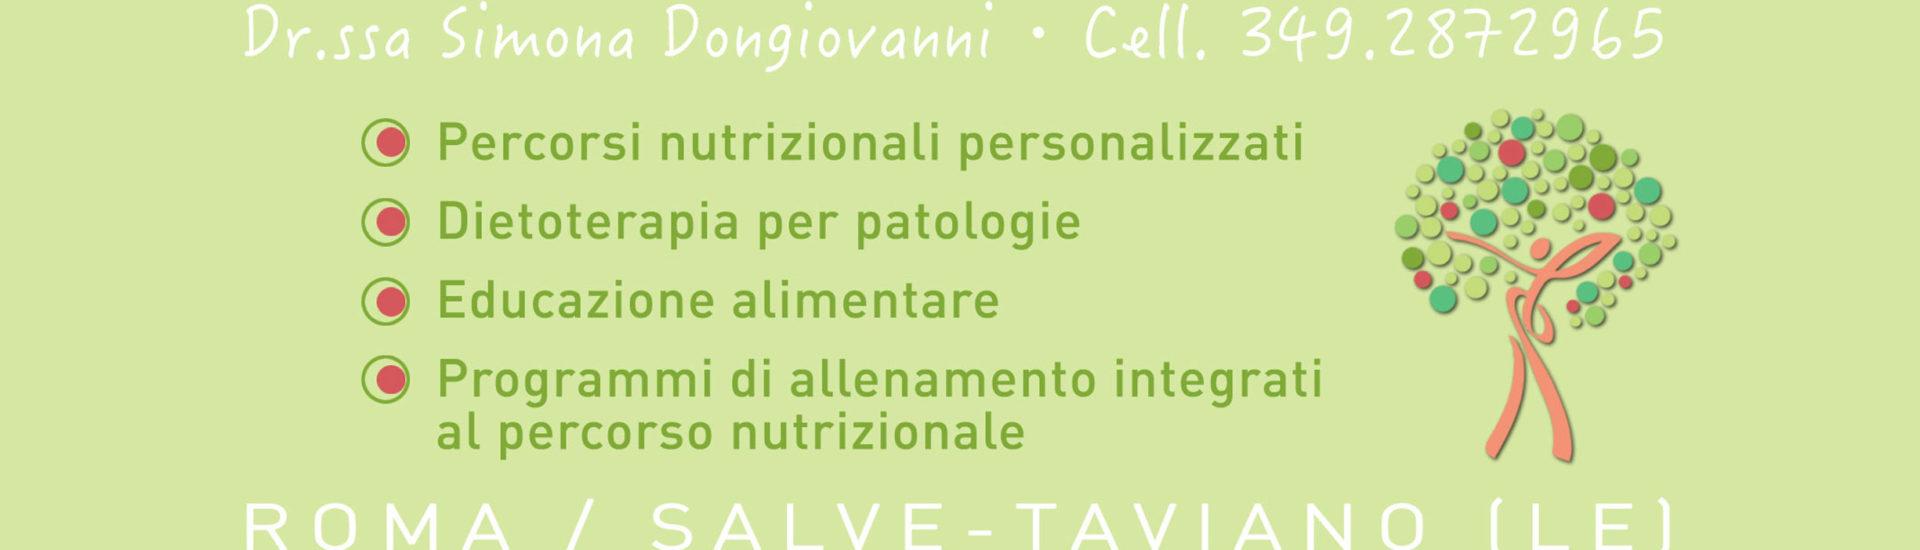 2-slide-dieta-nutrizione